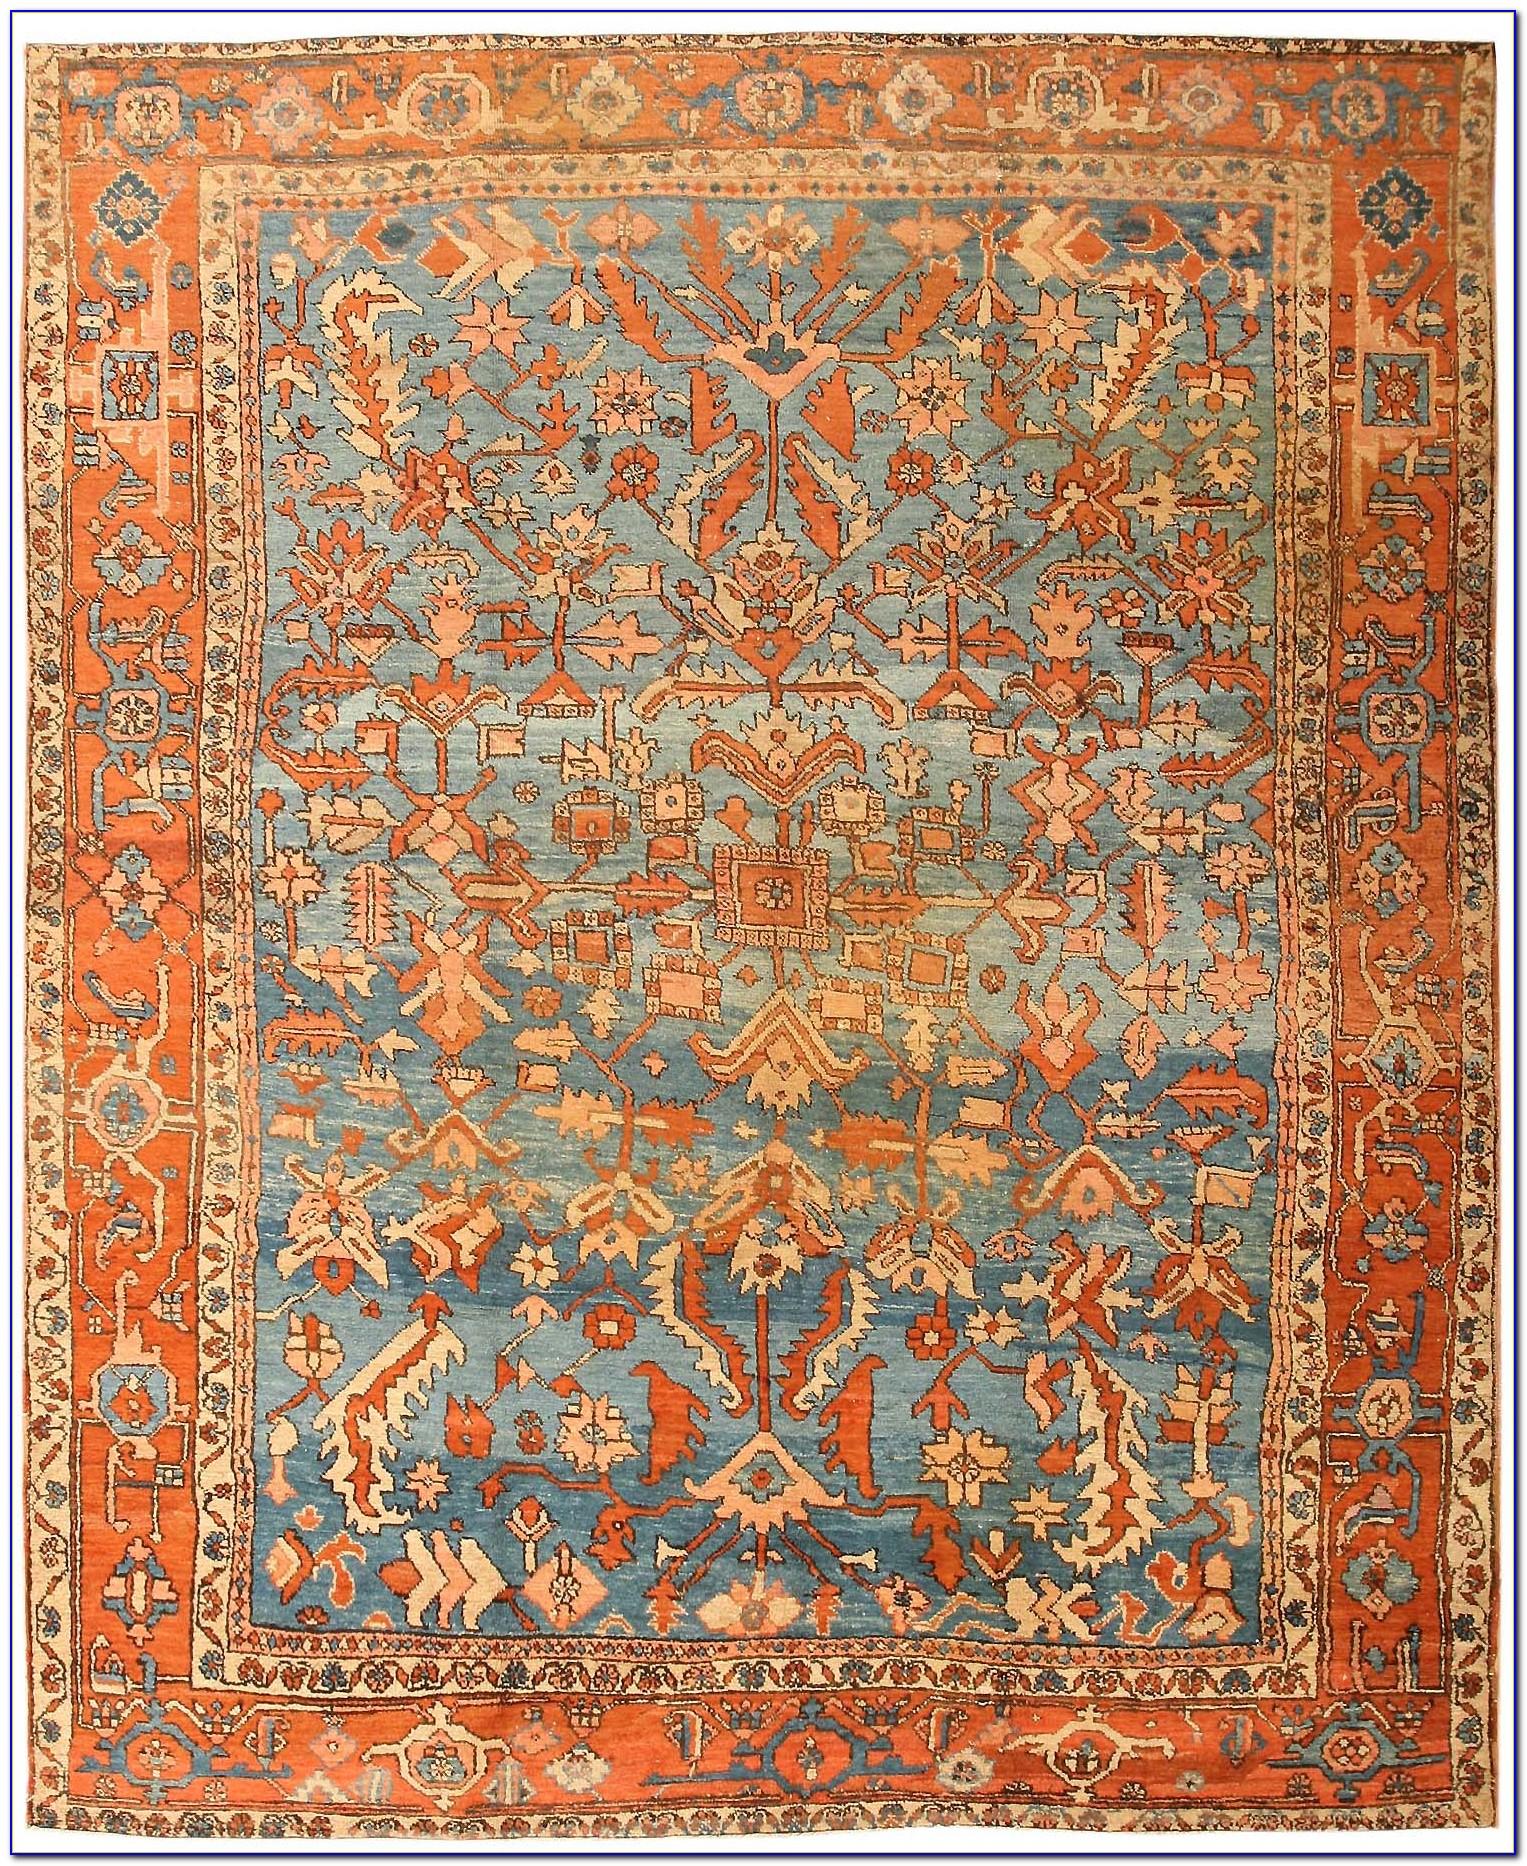 Antique Oriental Rugs Uk: Rugs : Home Design Ideas